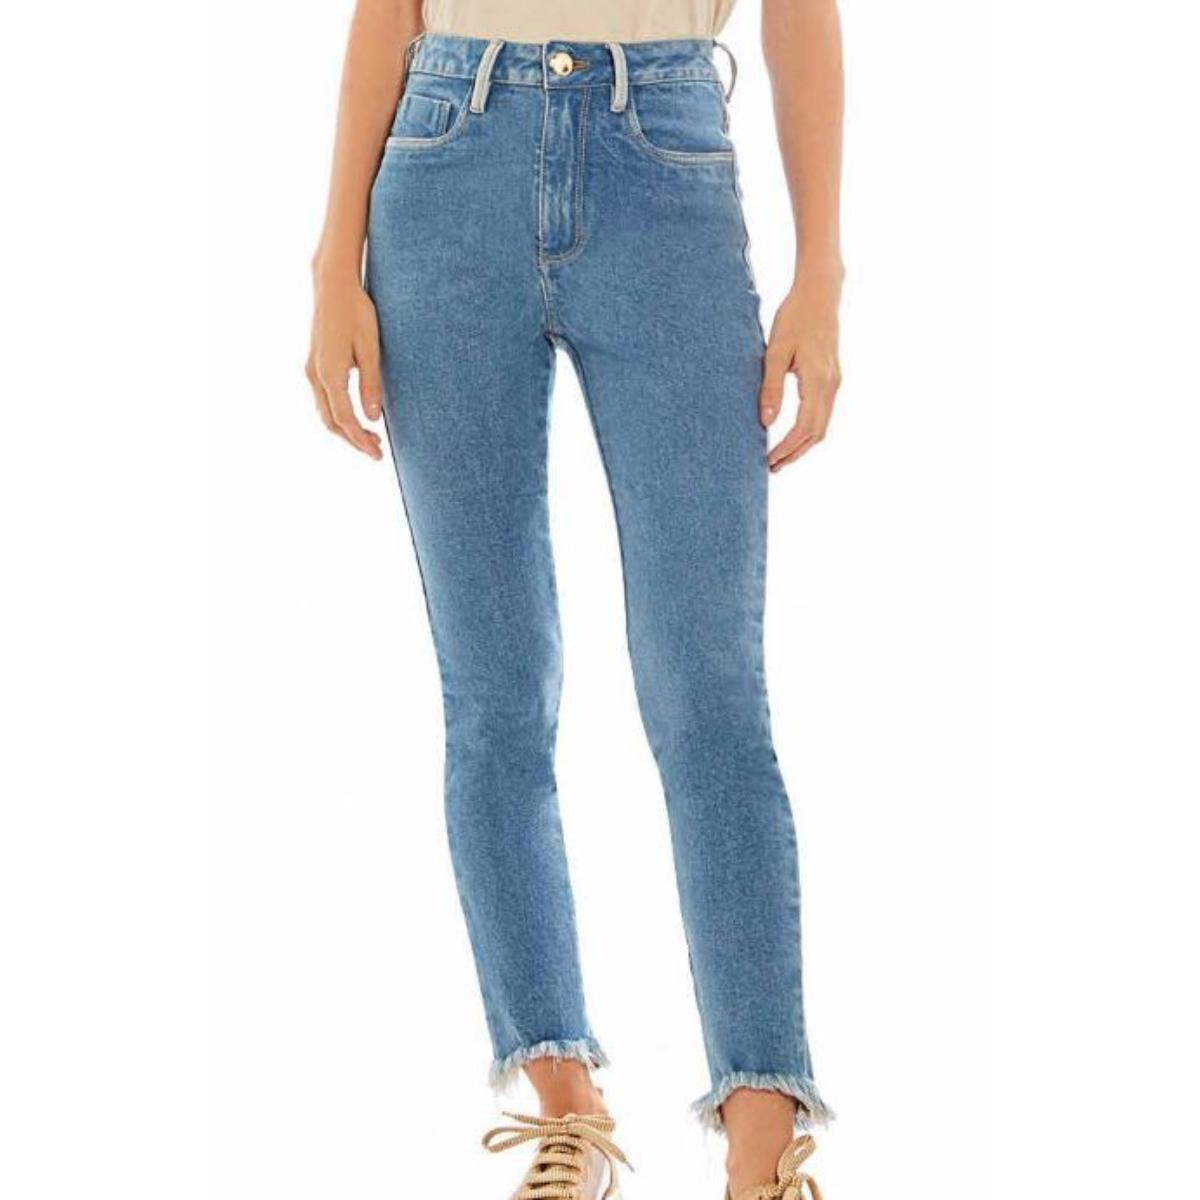 Calça Feminina Morena Rosa 10000204846 Jeans Claro